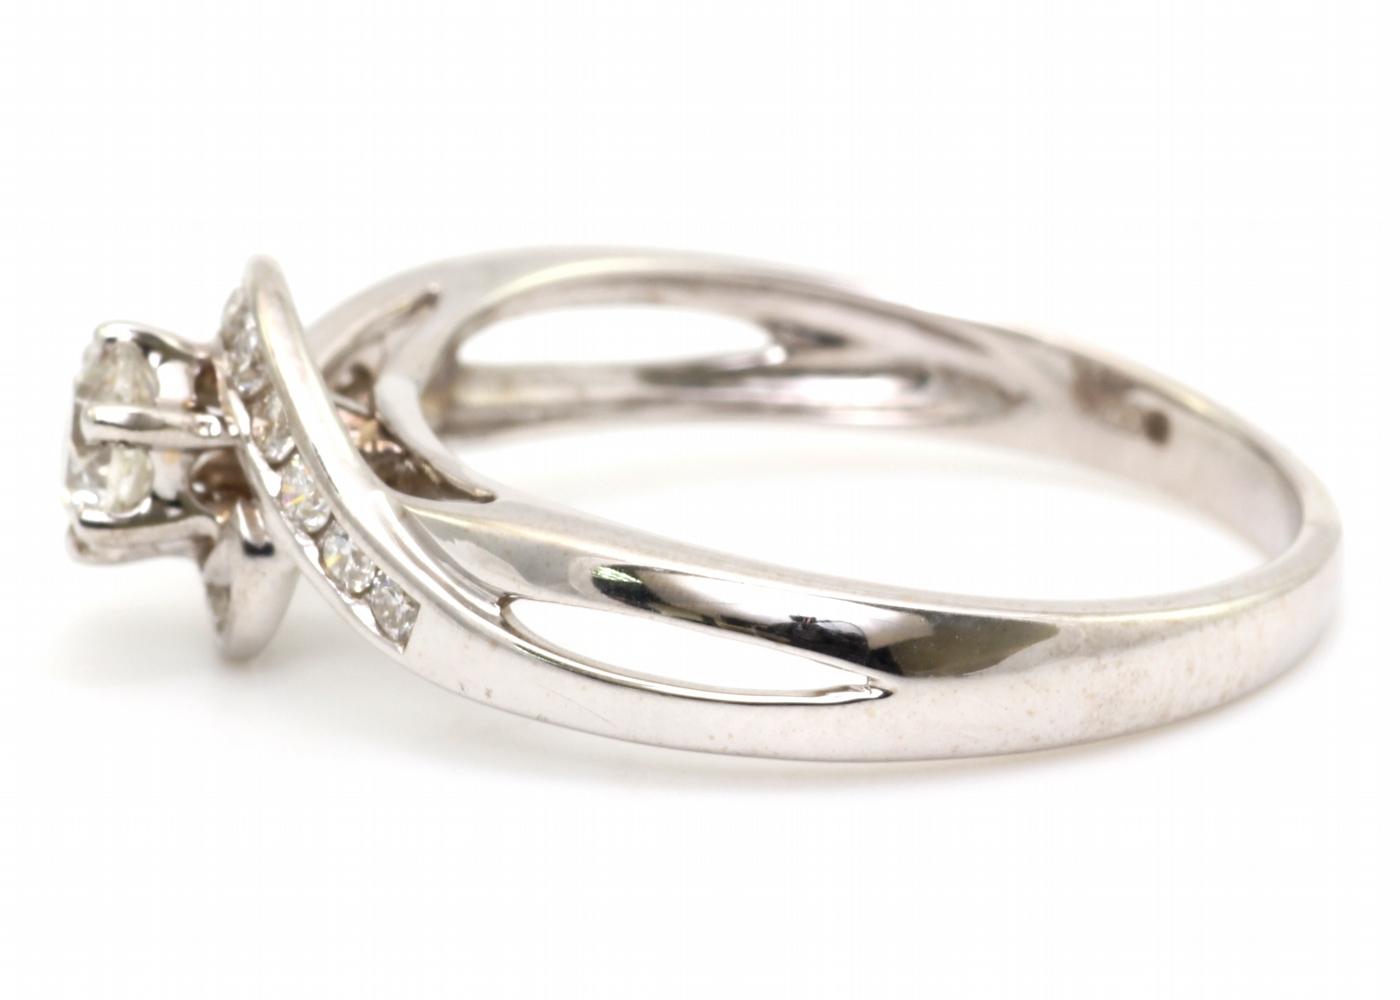 18ct White Gold Twist Diamond Ring 0.54 Carats - Image 3 of 4